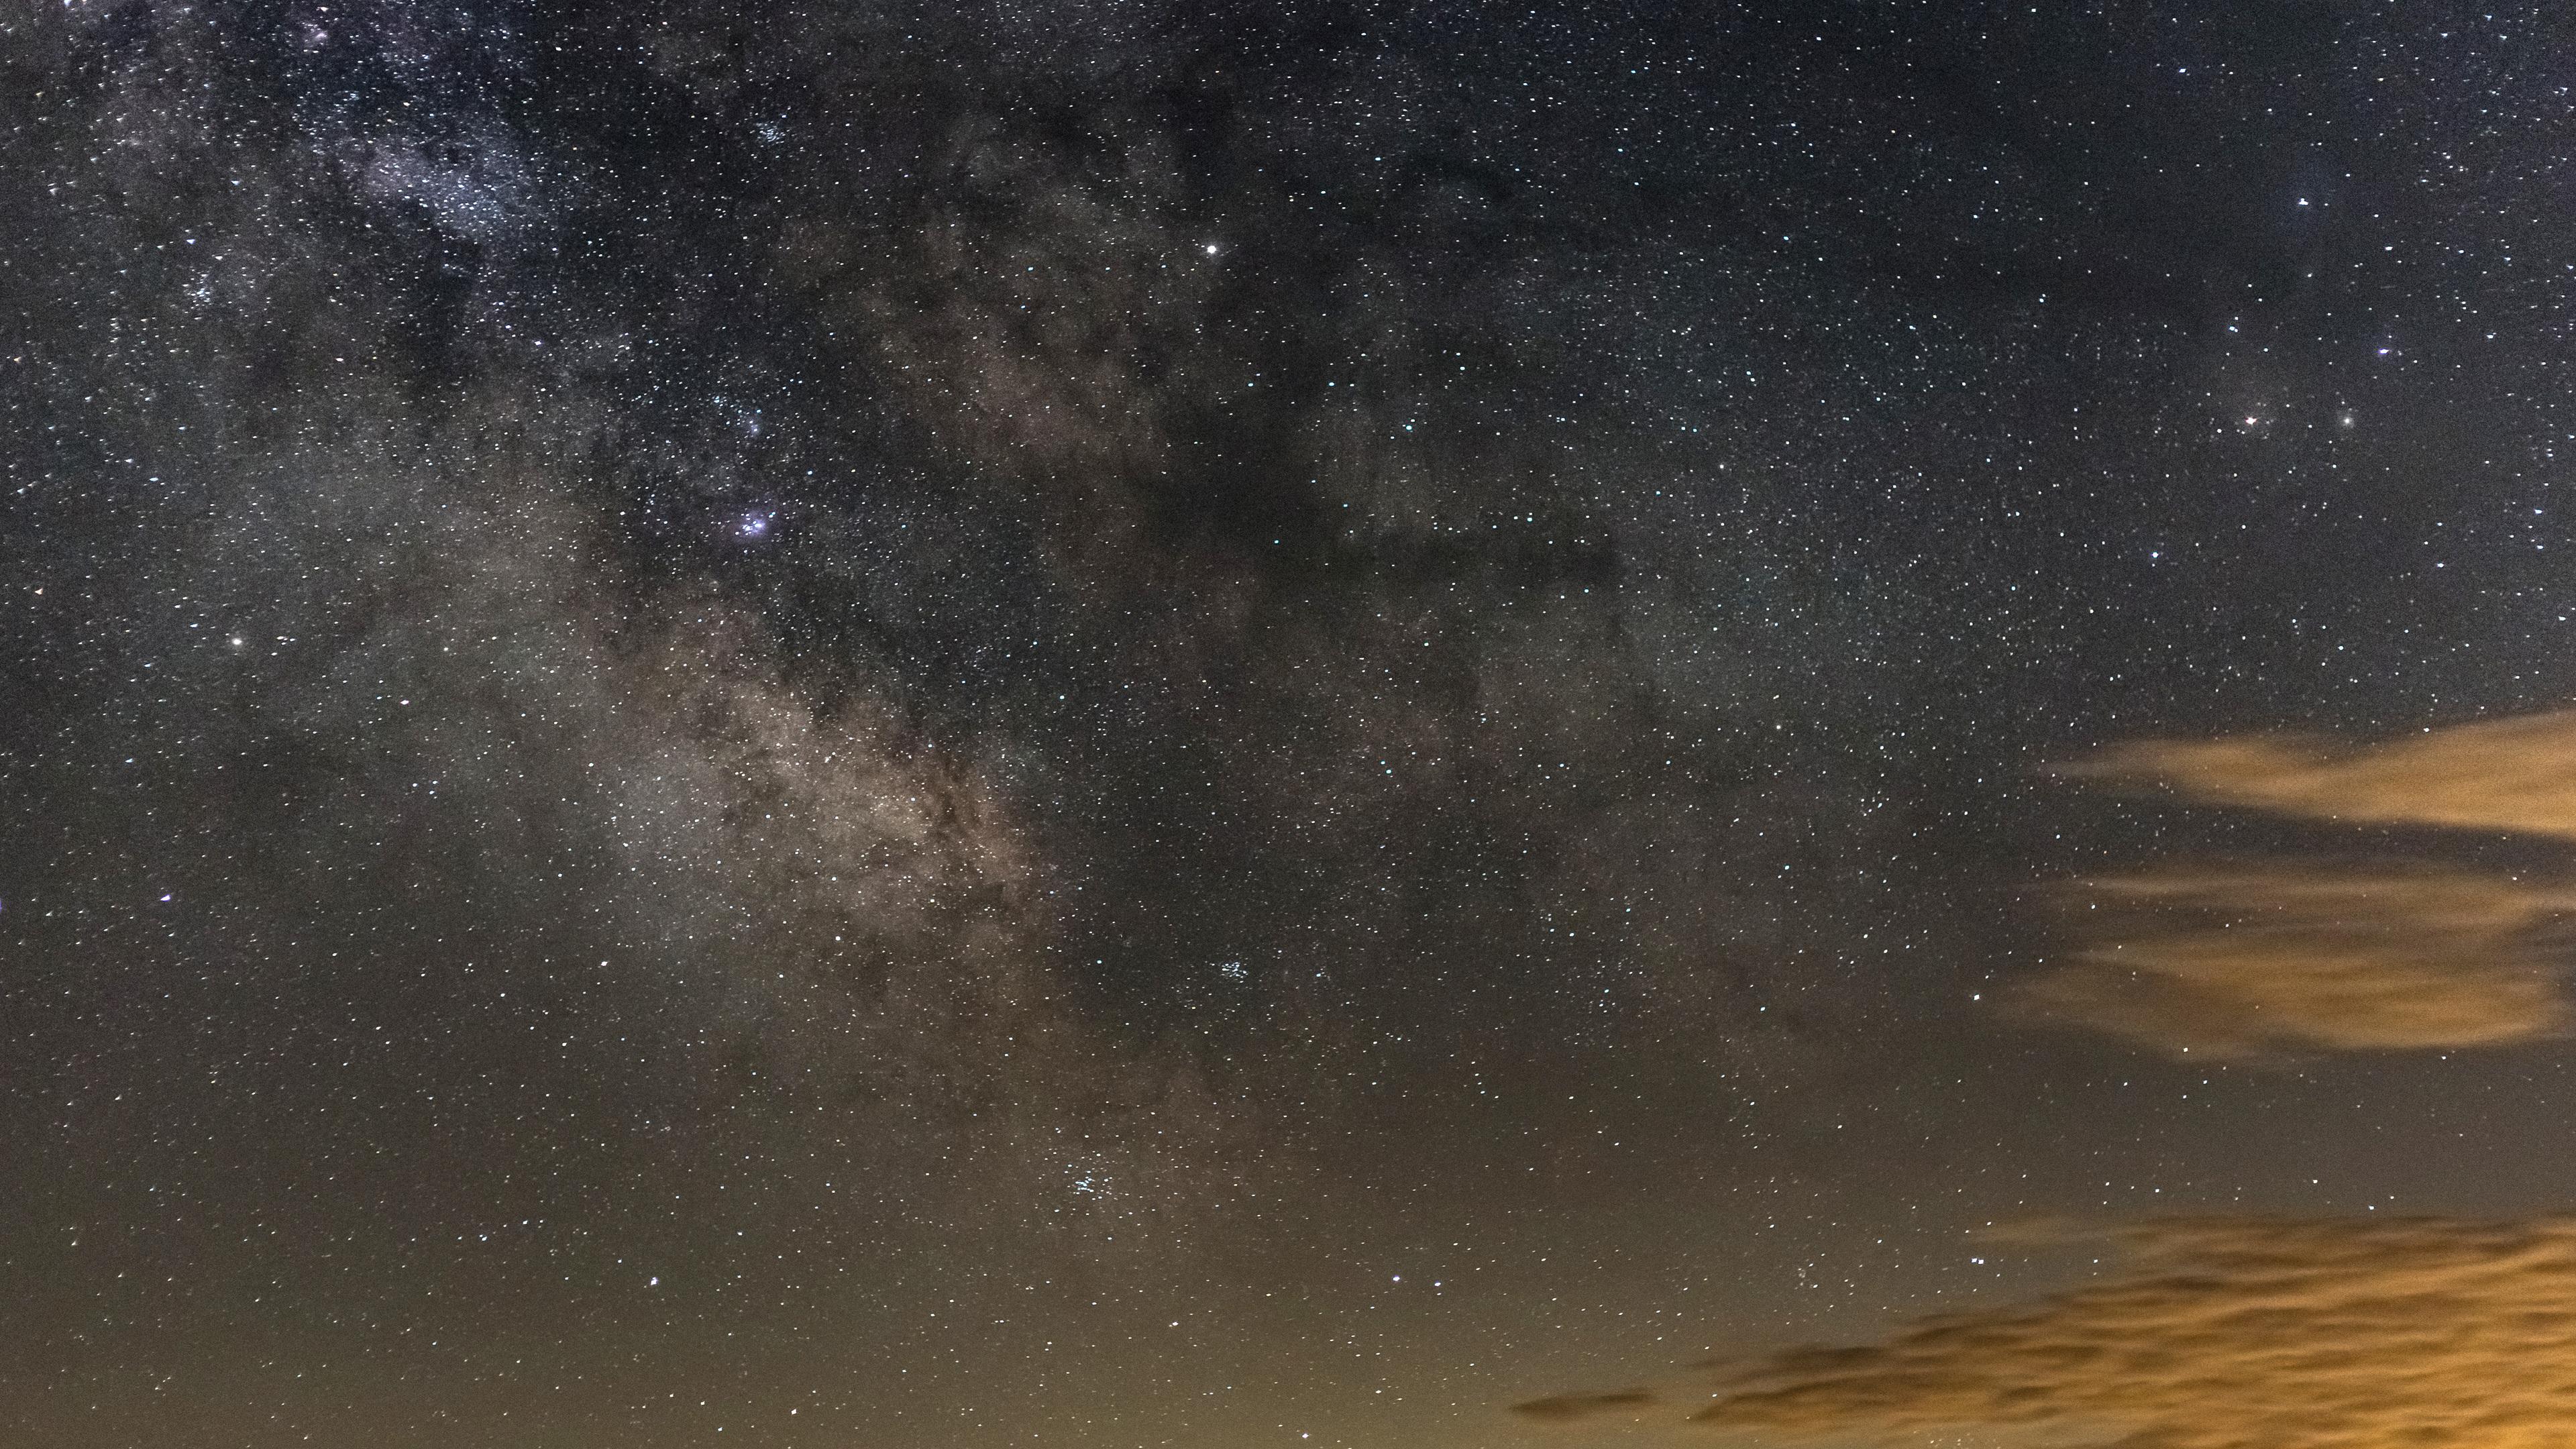 milky way stars galaxy constellations 4k 1546278920 - Milky Way Stars Galaxy Constellations 4k - stars wallpapers, milky way wallpapers, hd-wallpapers, galaxy wallpapers, digital universe wallpapers, constellations wallpapers, 5k wallpapers, 4k-wallpapers